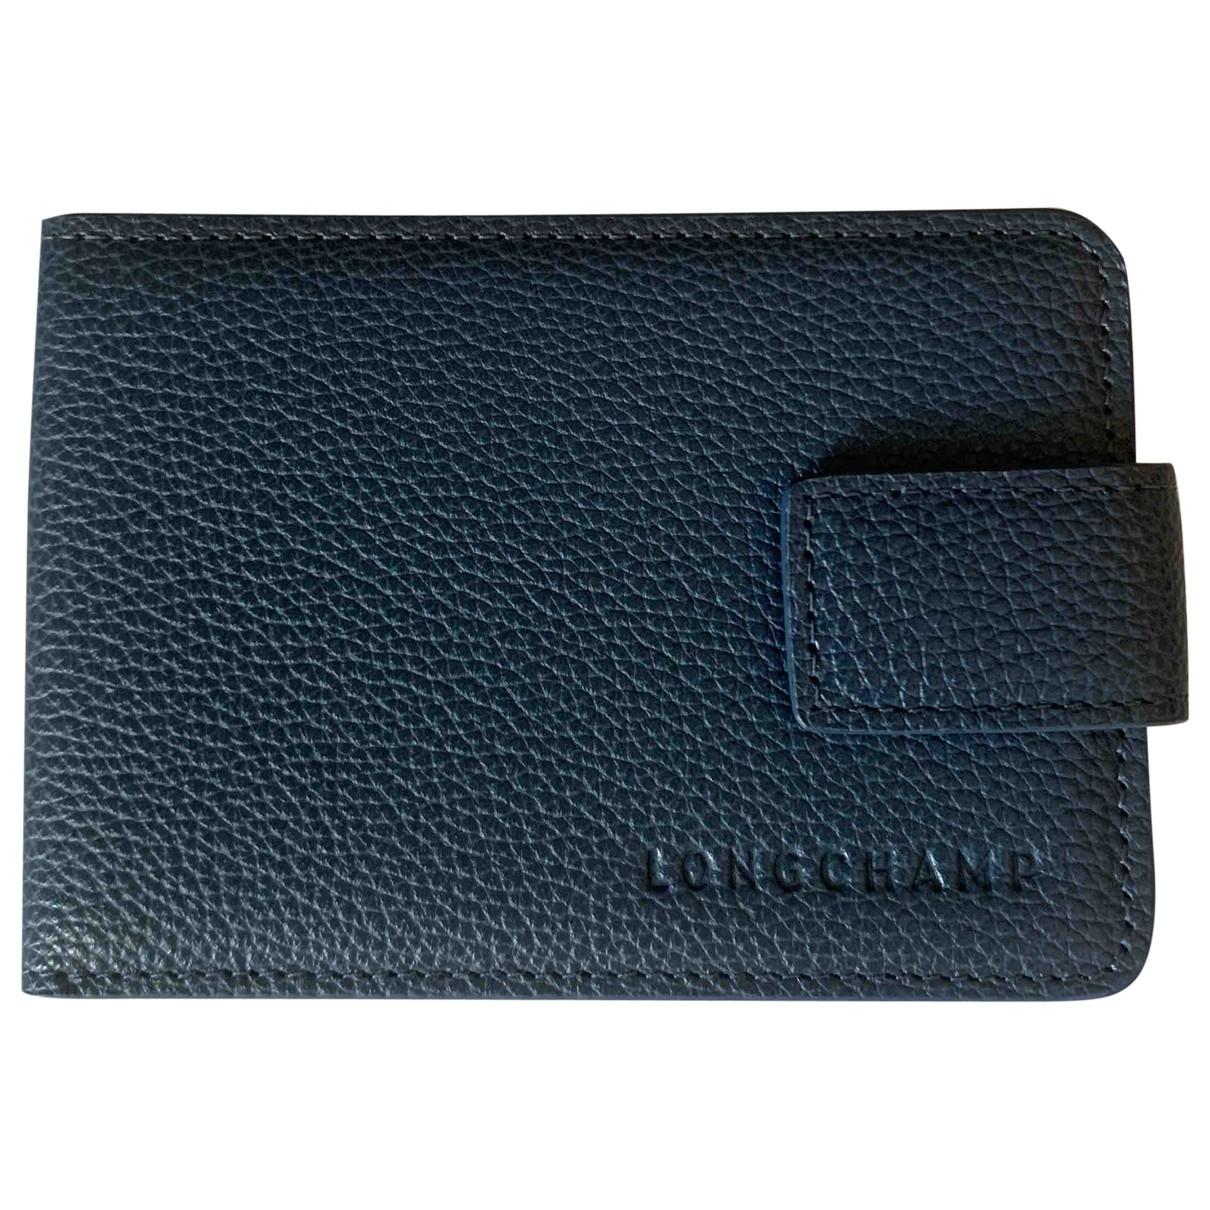 Longchamp \N Kleinlederwaren in  Blau Leder